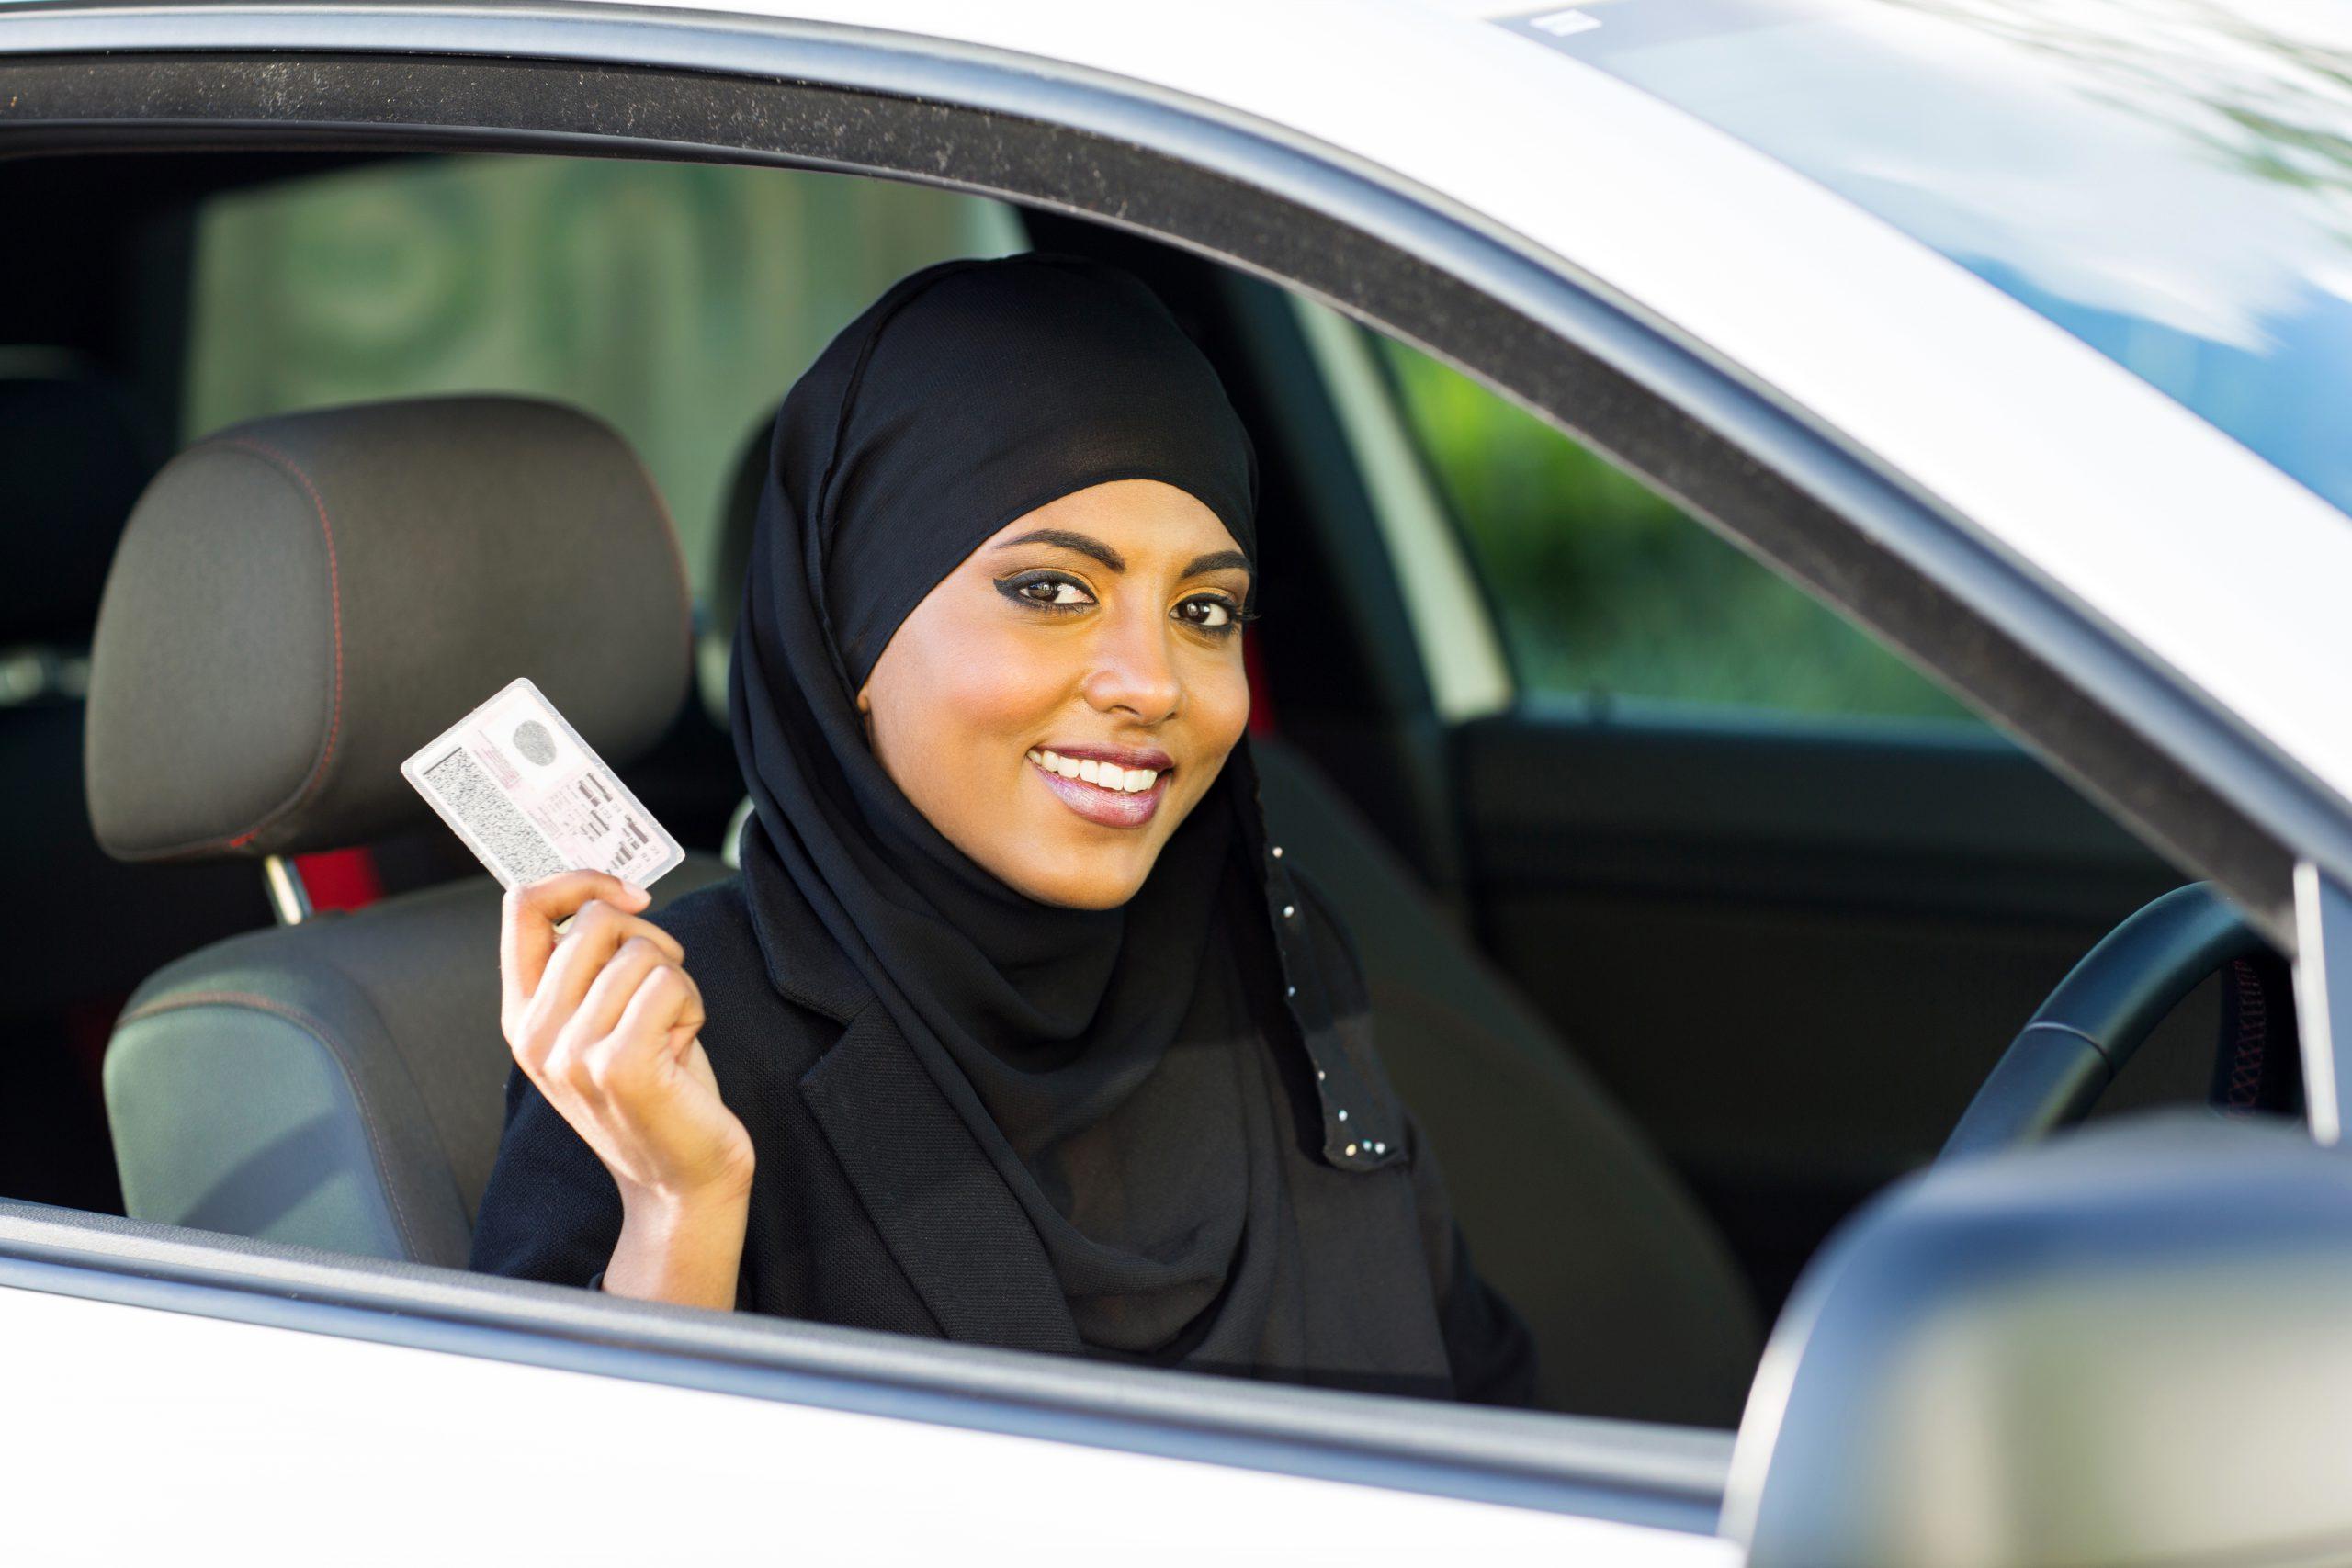 rijbewijs halen rotterdam